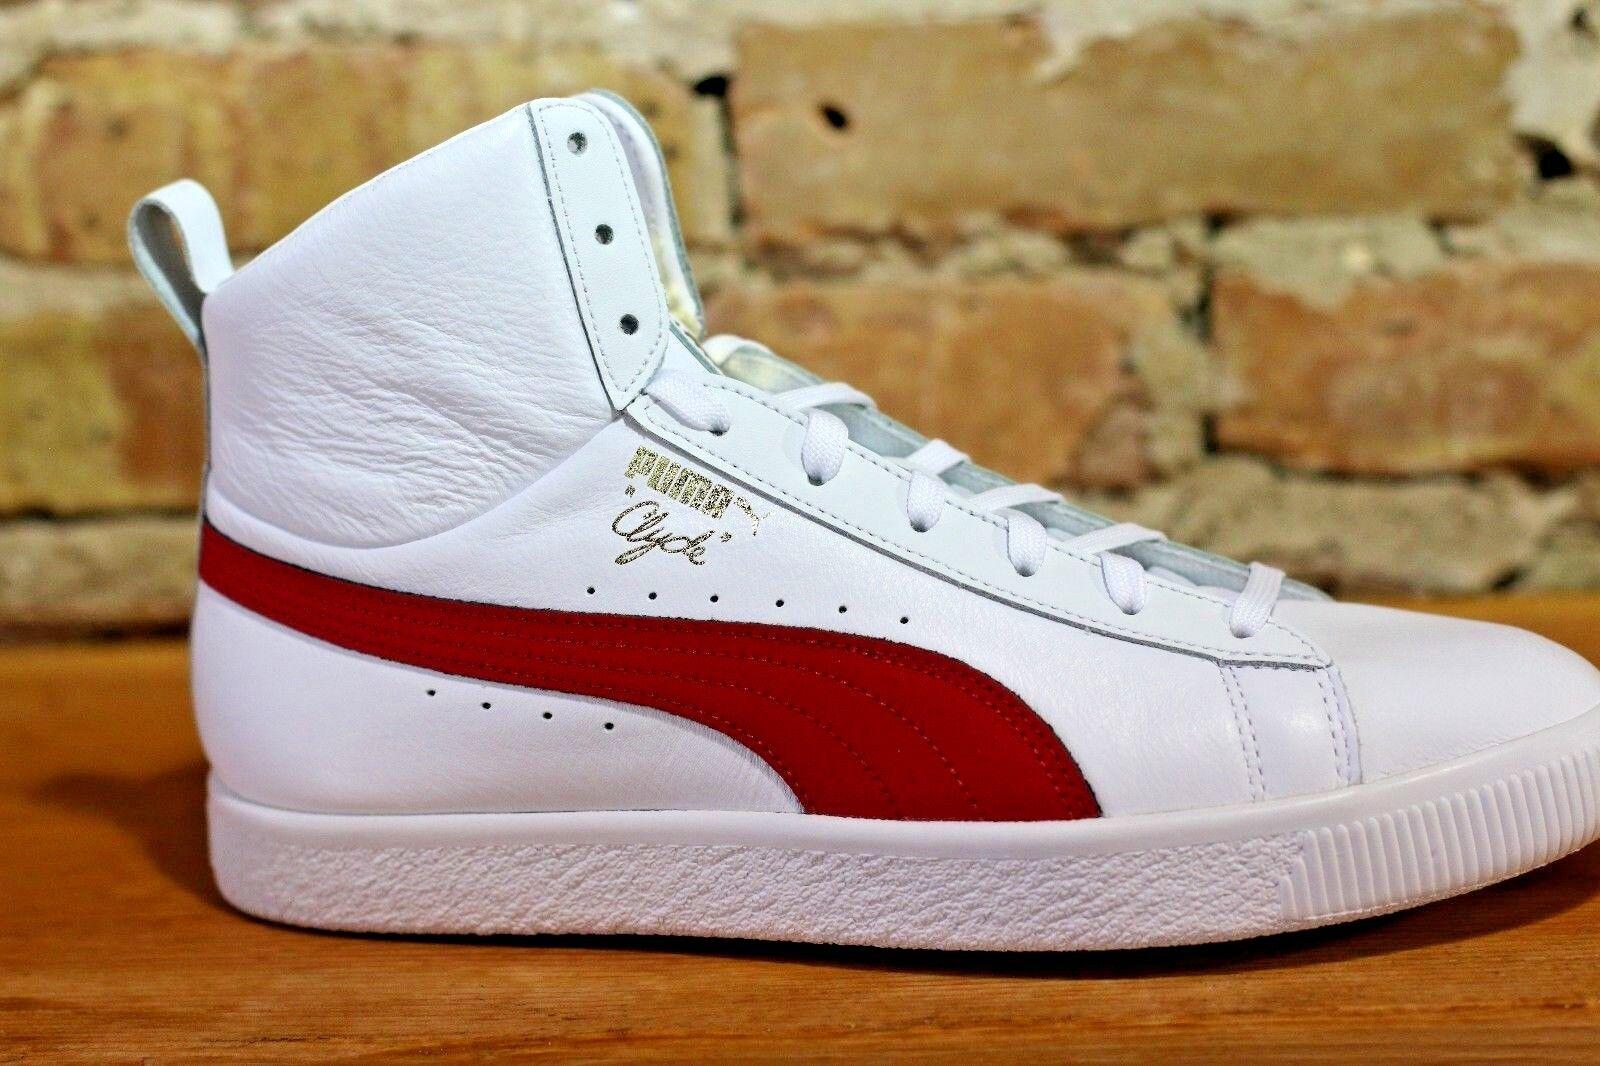 Puma Uomo Shoes White White White Pelle Clyde Core Mid - Classics Fashion and Sports 7a60d8